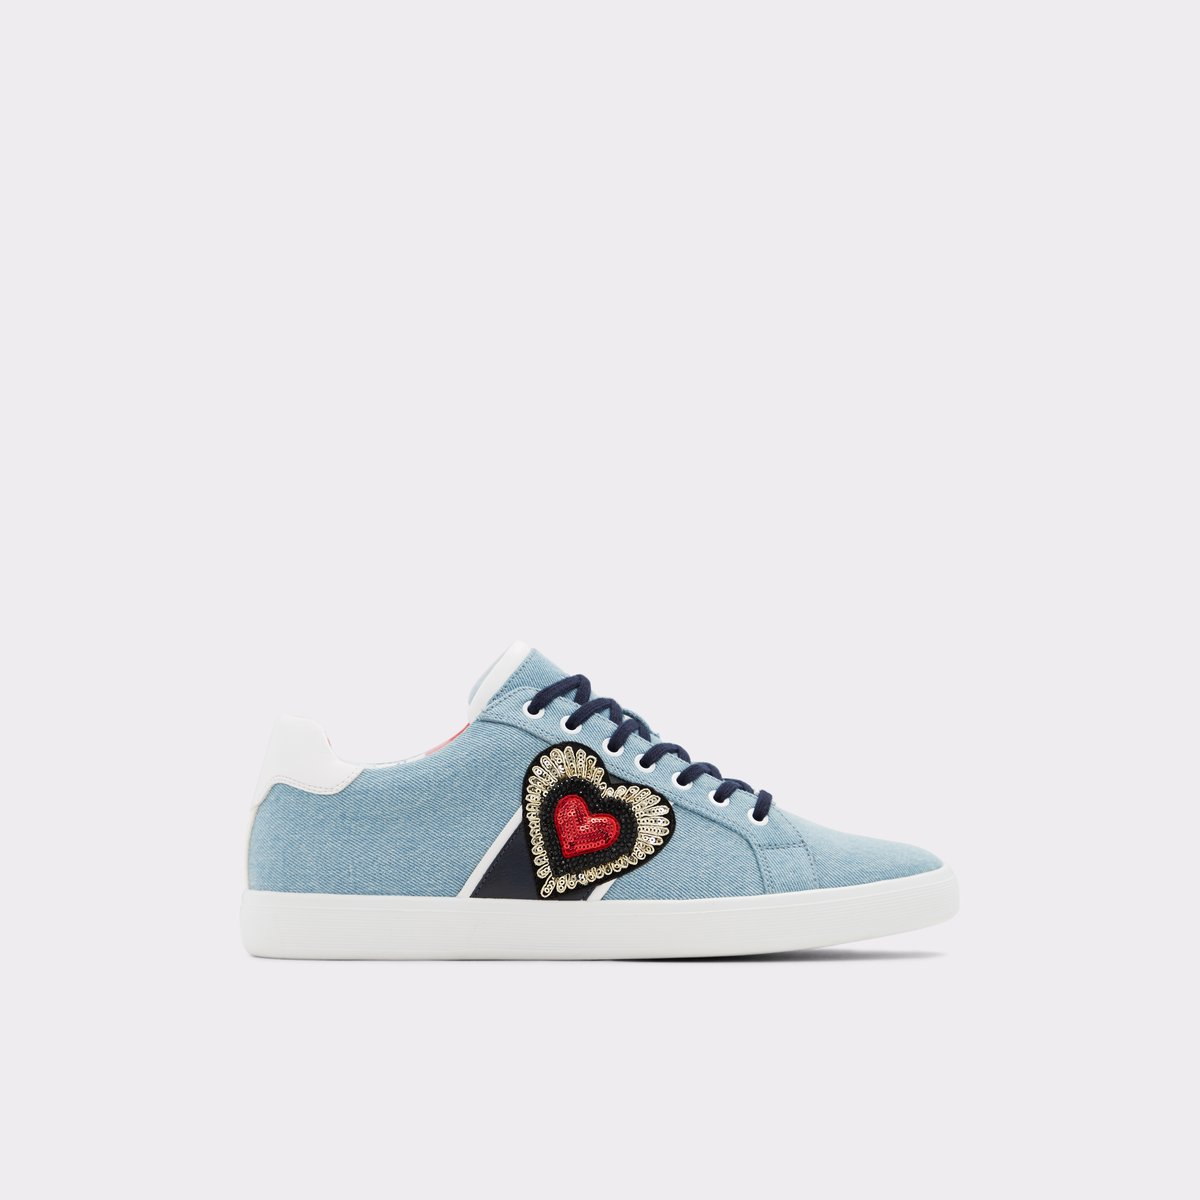 Pramju Light Blue Men's Sneakers | ALDO US